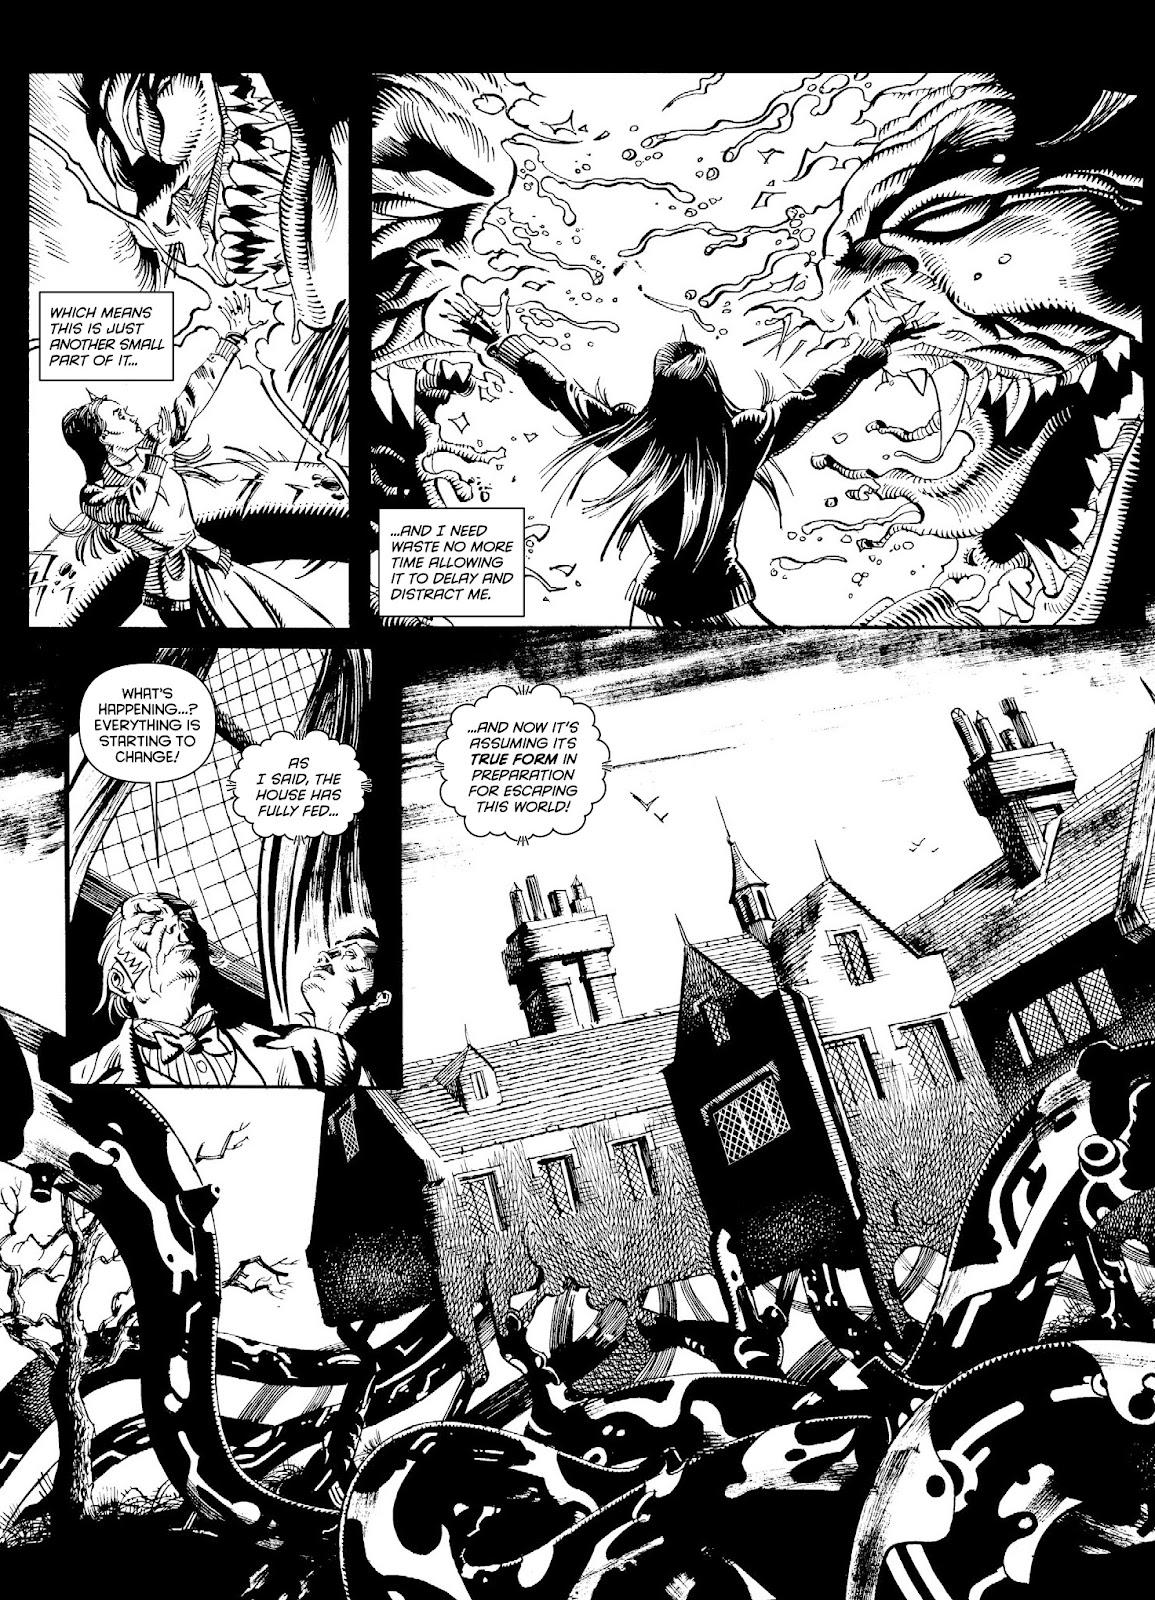 Judge Dredd Megazine (Vol. 5) issue 427 - Page 103